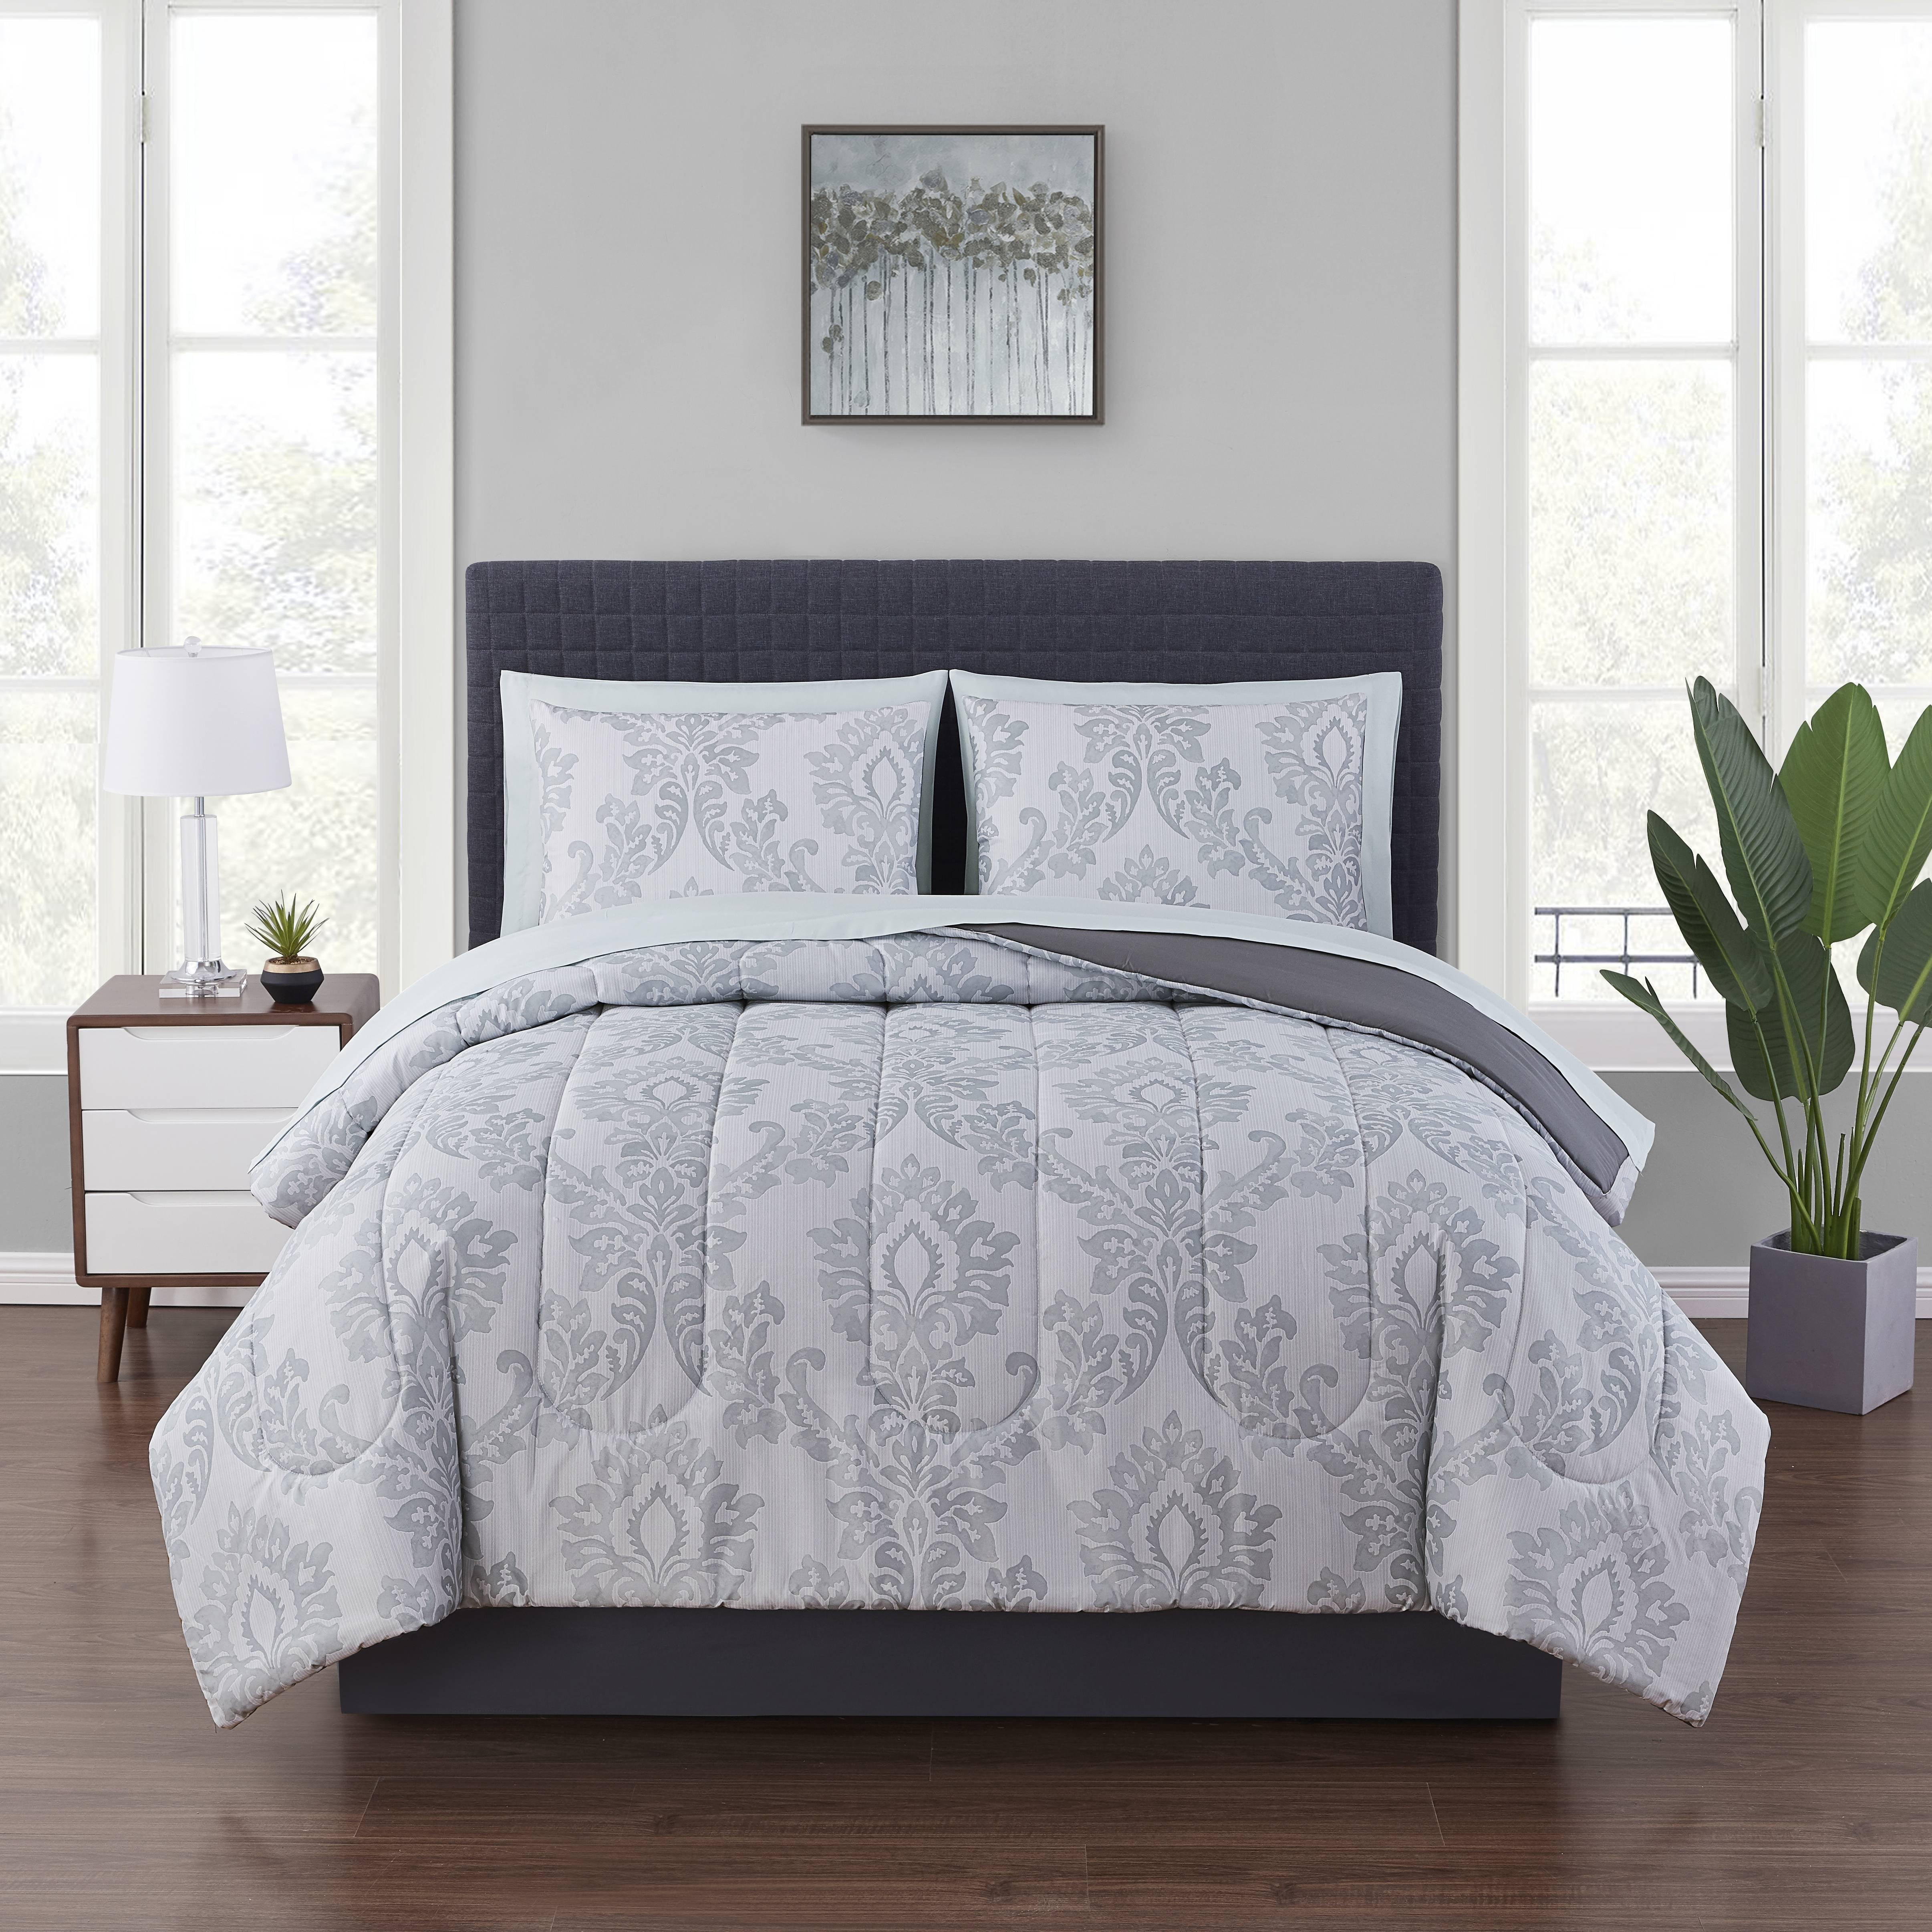 Mainstays Gray Pinstripe Damask 8 Piece Bed In A Bag Bedding Set With Sheet Set Queen Walmart Com Walmart Com